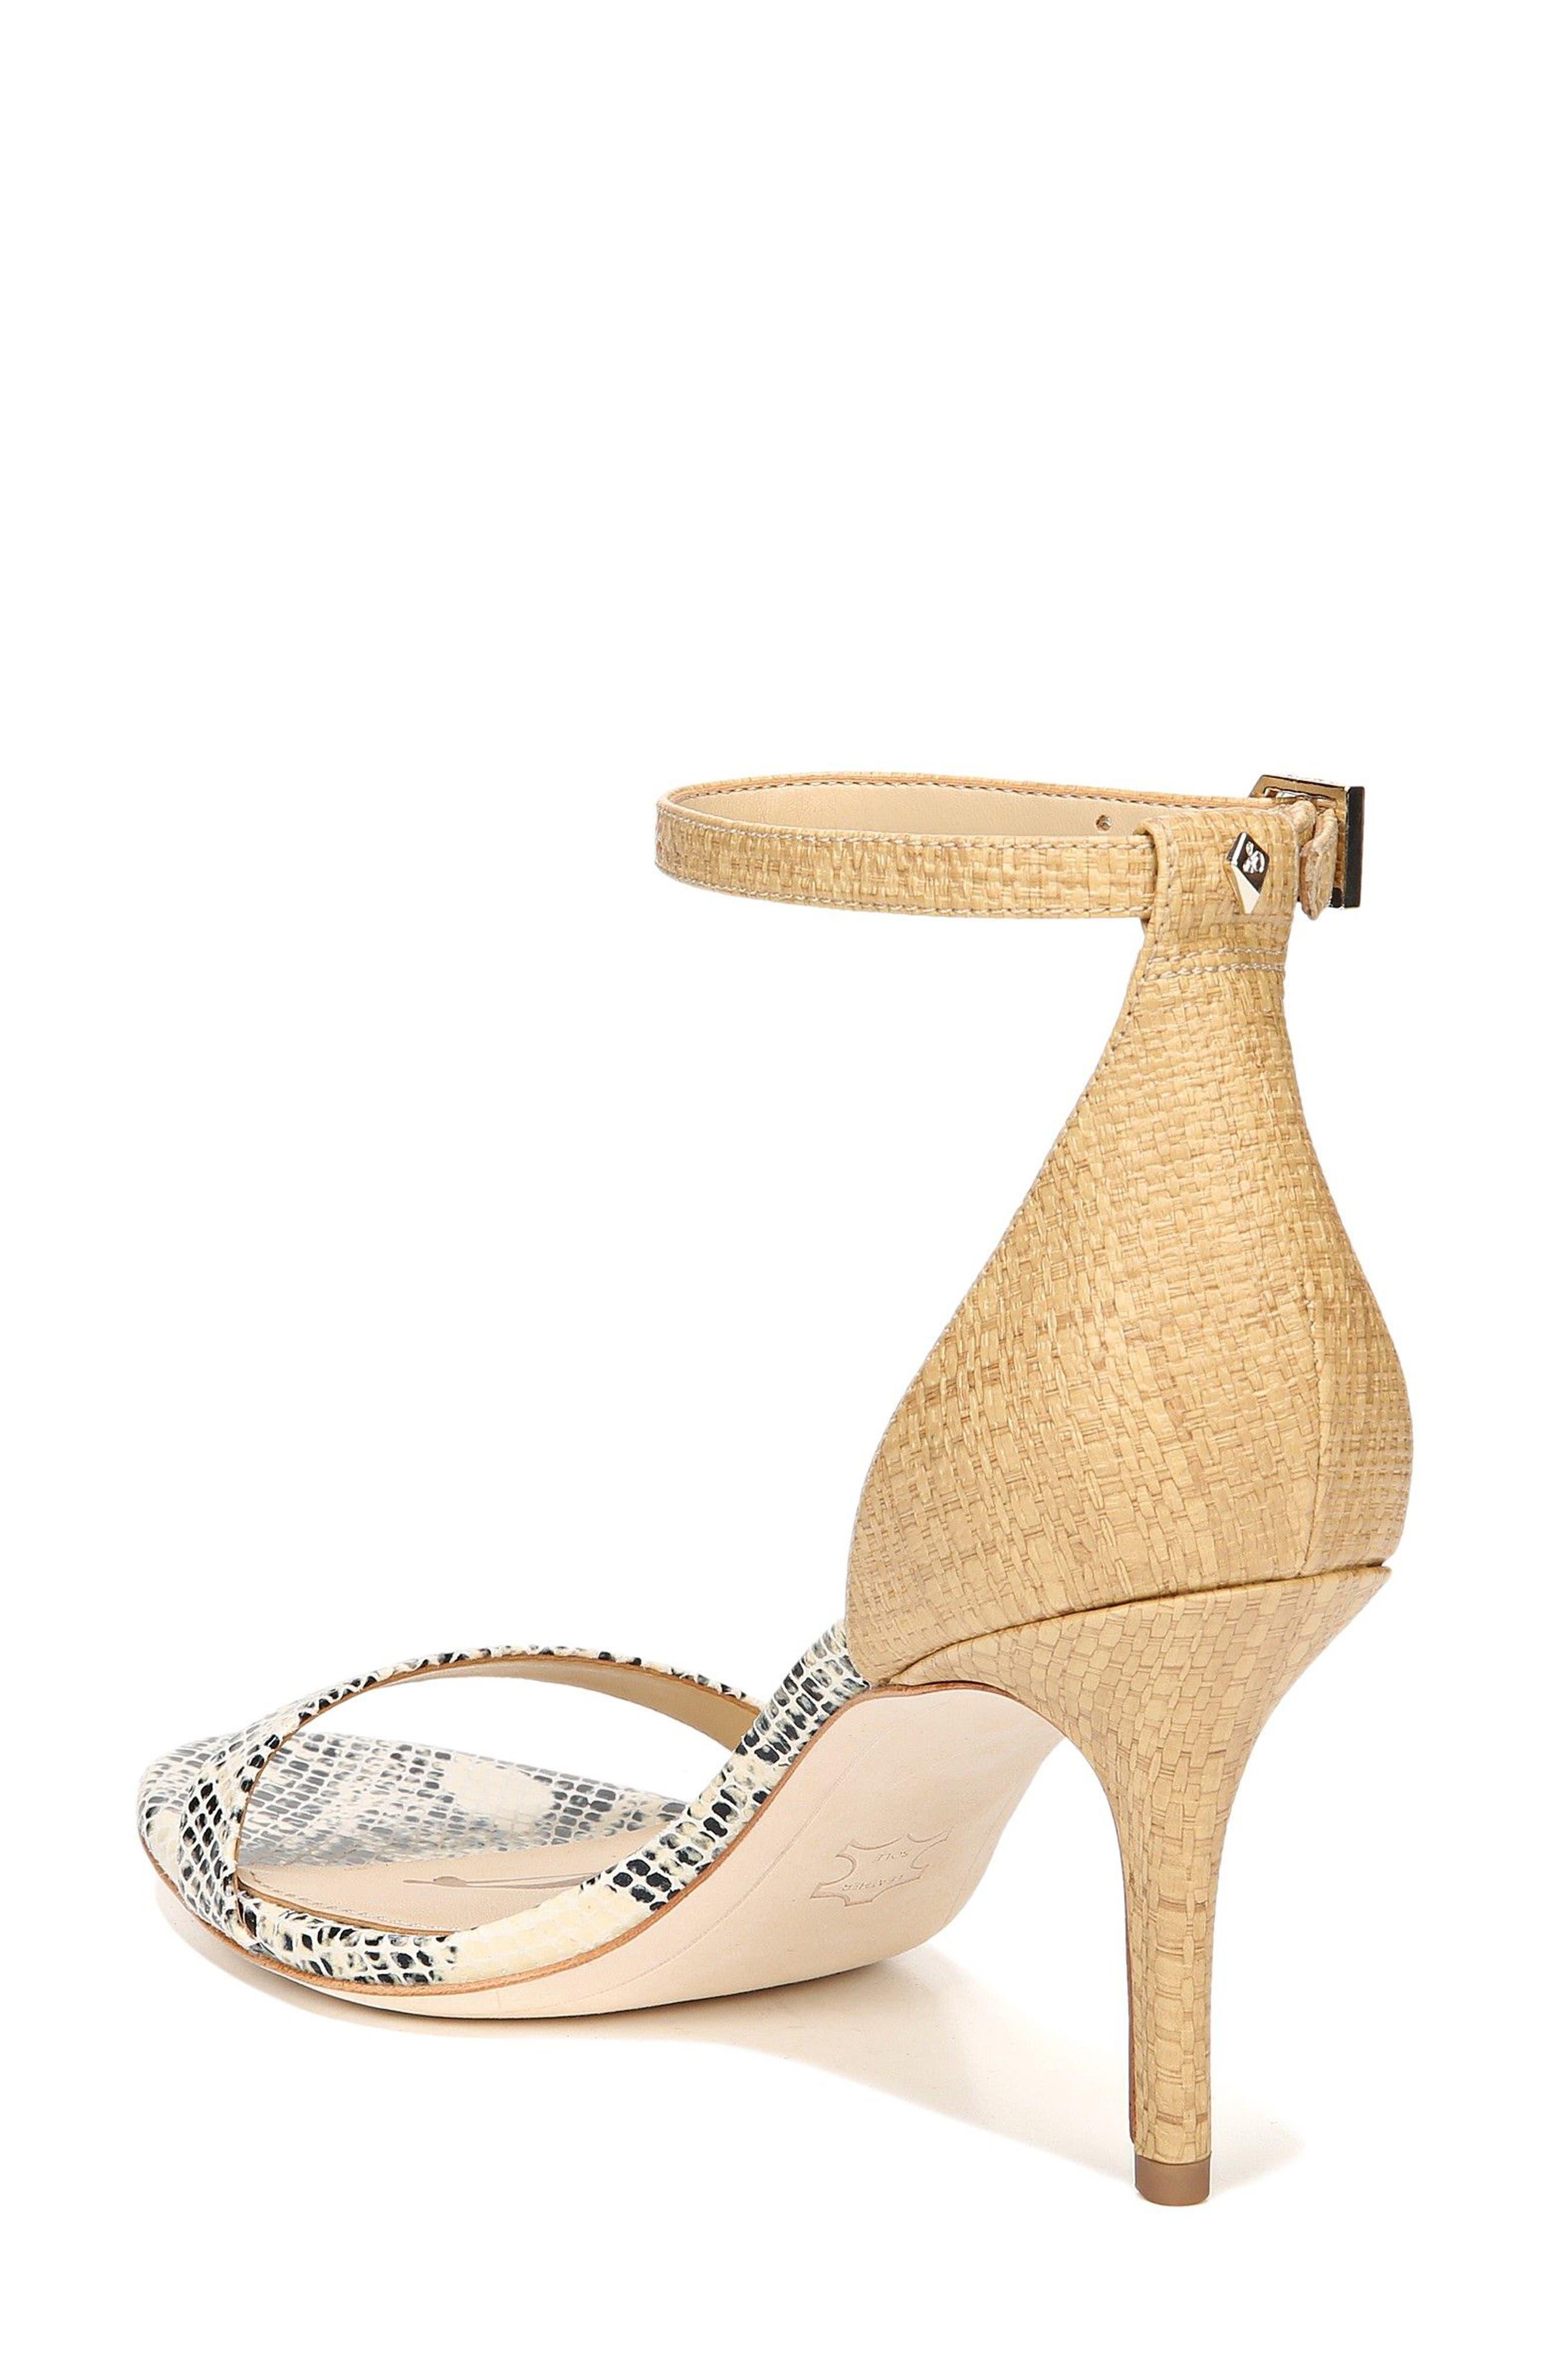 ,                             'Patti' Ankle Strap Sandal,                             Alternate thumbnail 175, color,                             250